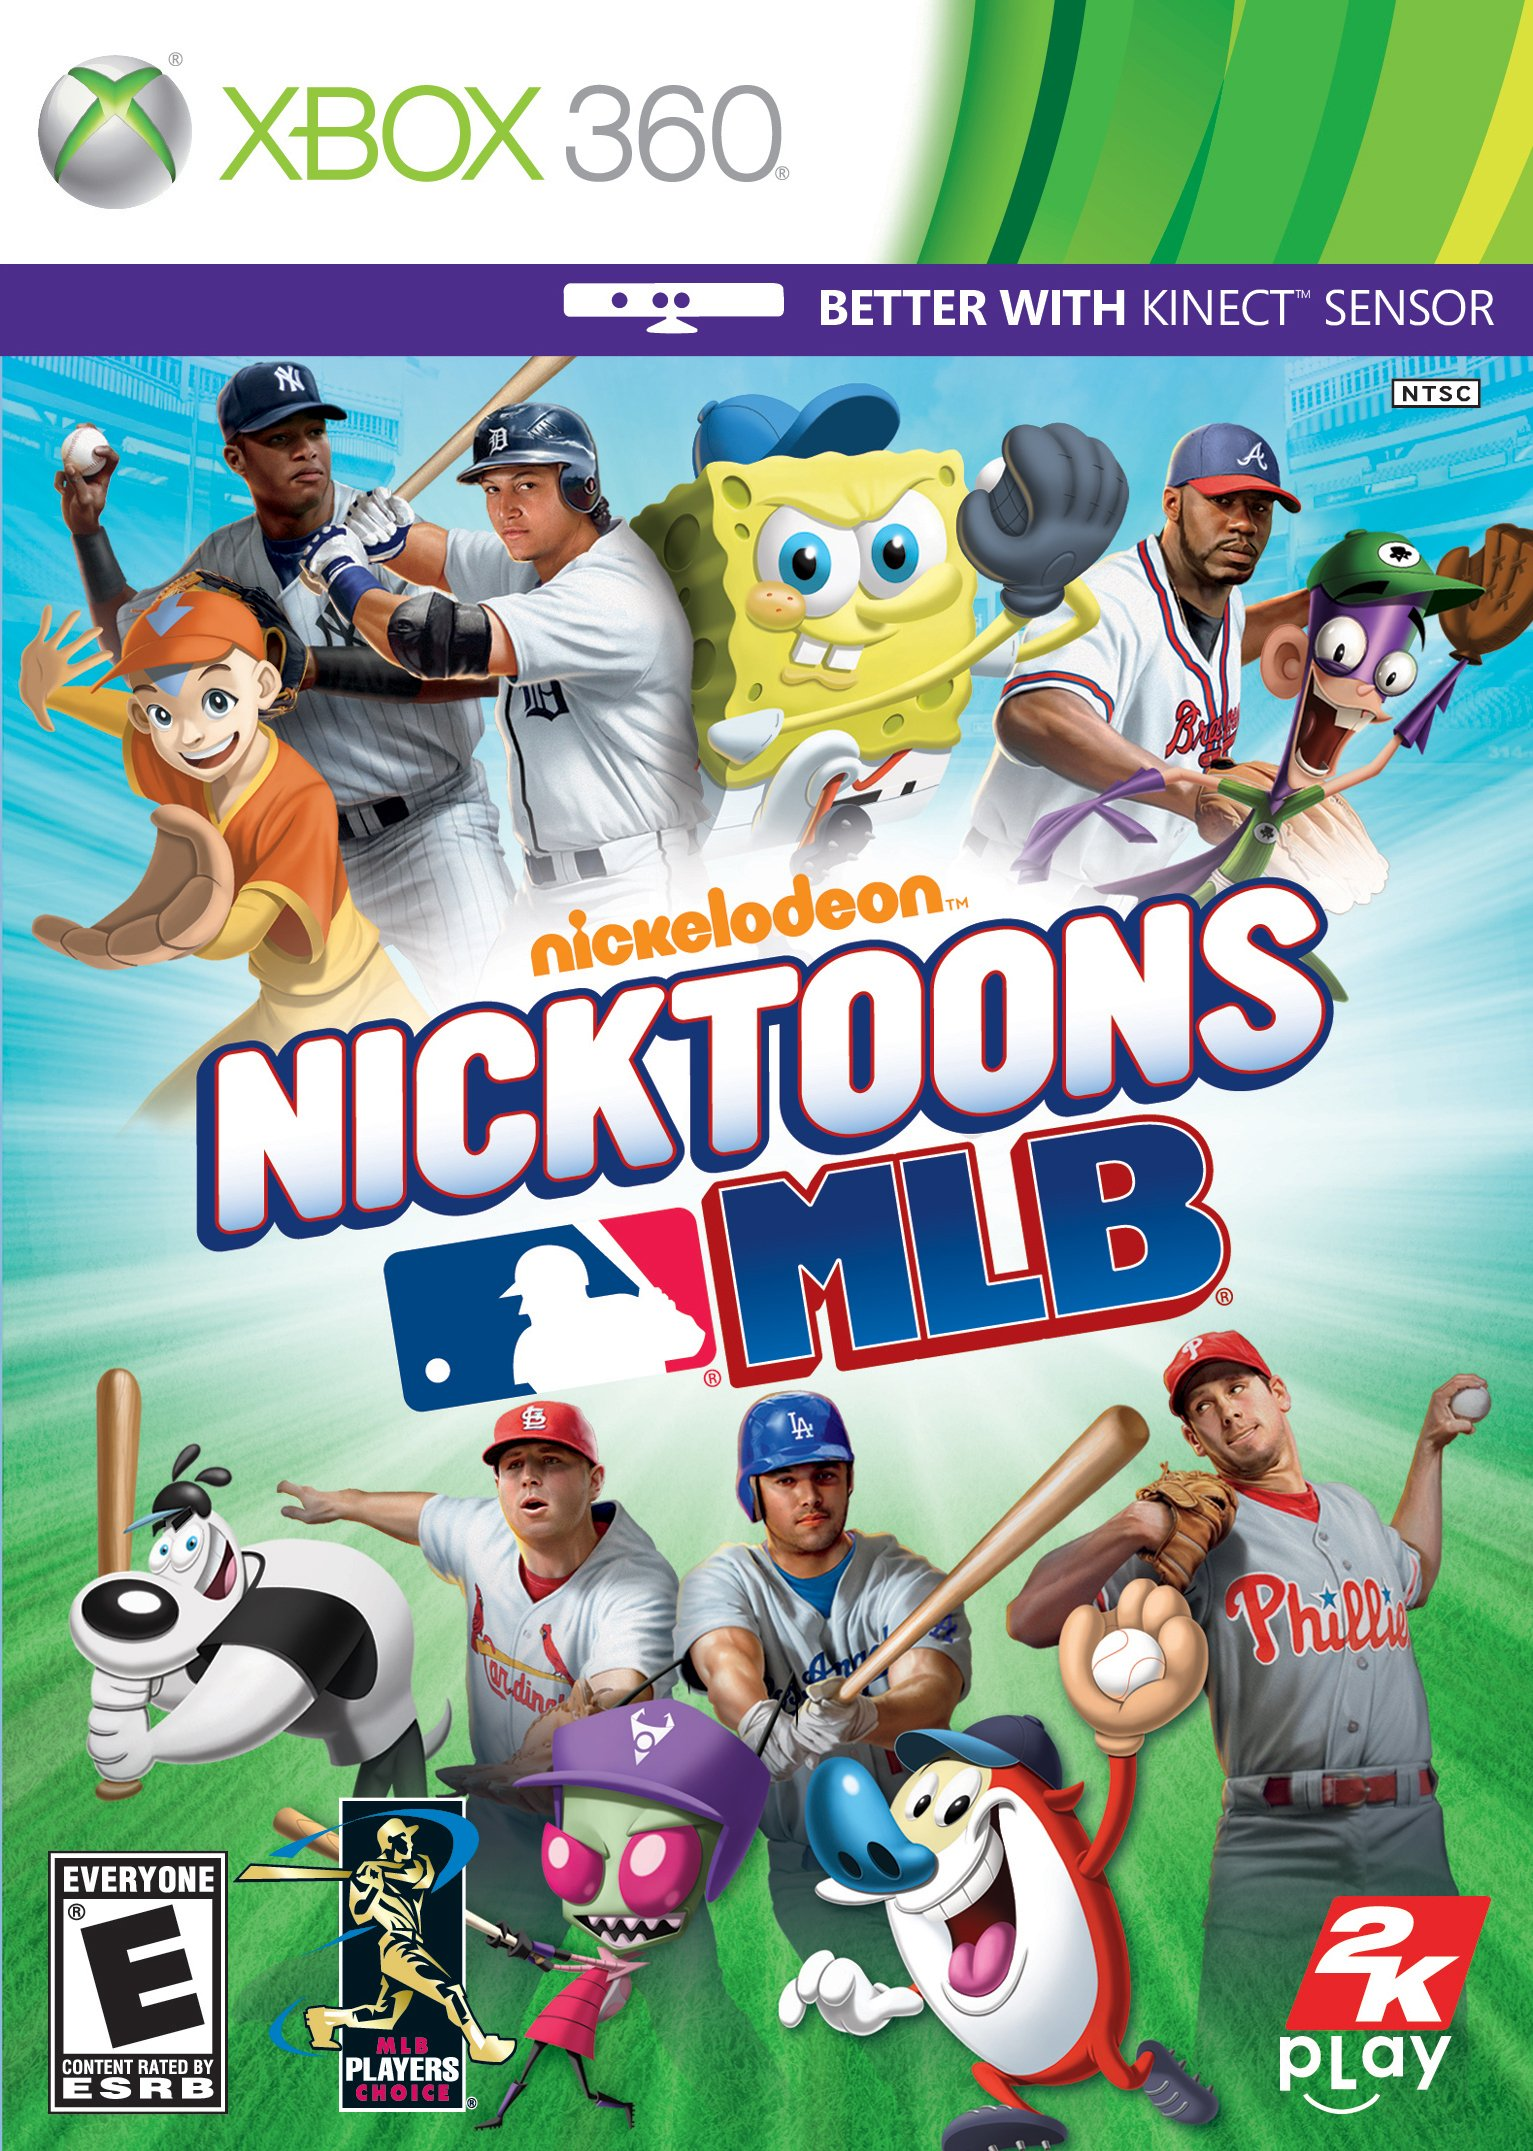 Nicktoons MLB - Xbox 360 by 2K (Image #1)